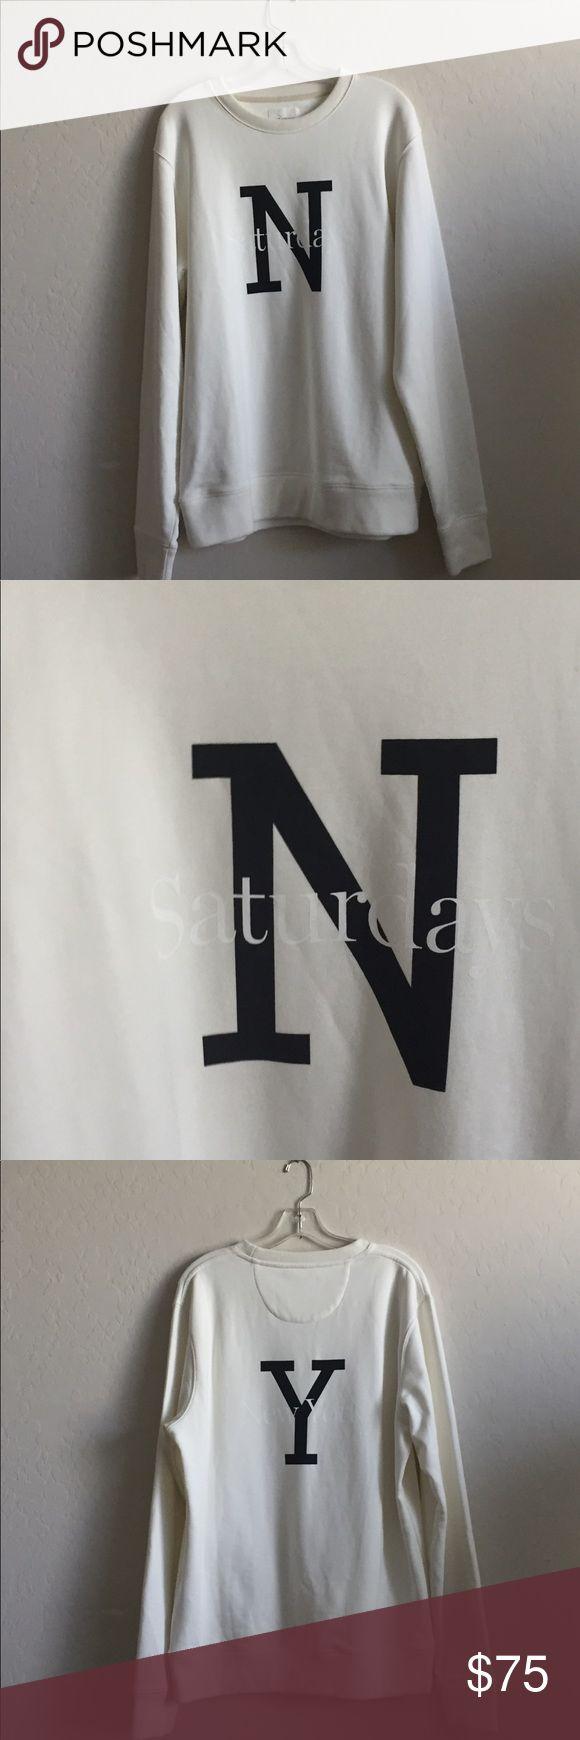 Saturdays Surf NY ecru cotton sweatshirt- NWOT Saturdays NY ecru cotton sweatshirt with white and black logo graphic -NWOT Saturdays New York City Shirts Sweatshirts & Hoodies